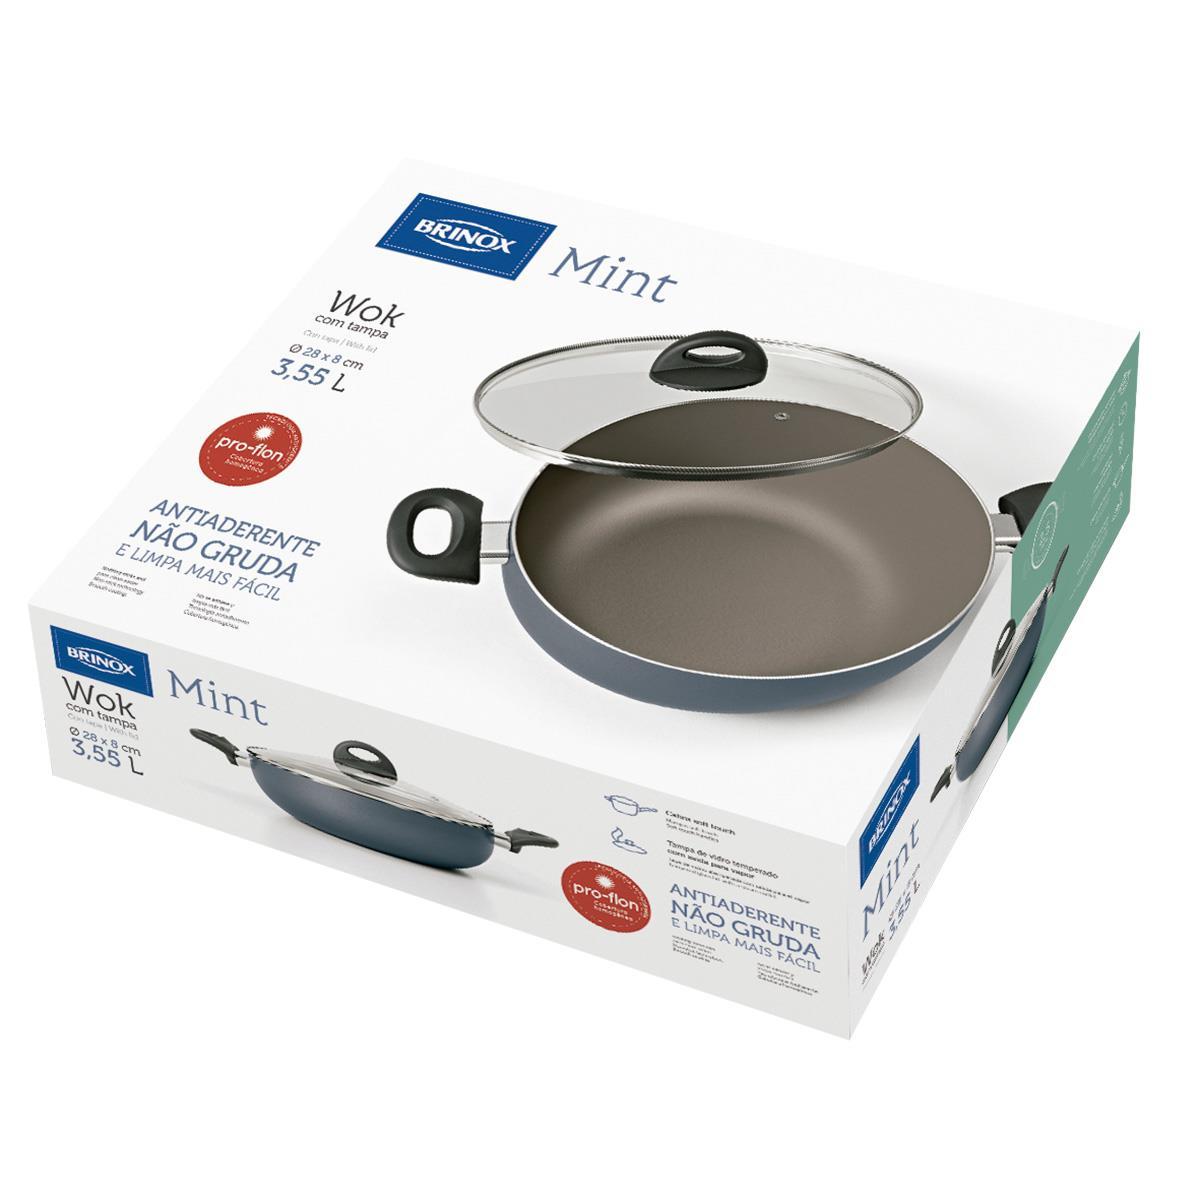 Panela wok com tampa 28cm antiaderente mint cobalto brinox na estrela10 fandeluxe Image collections